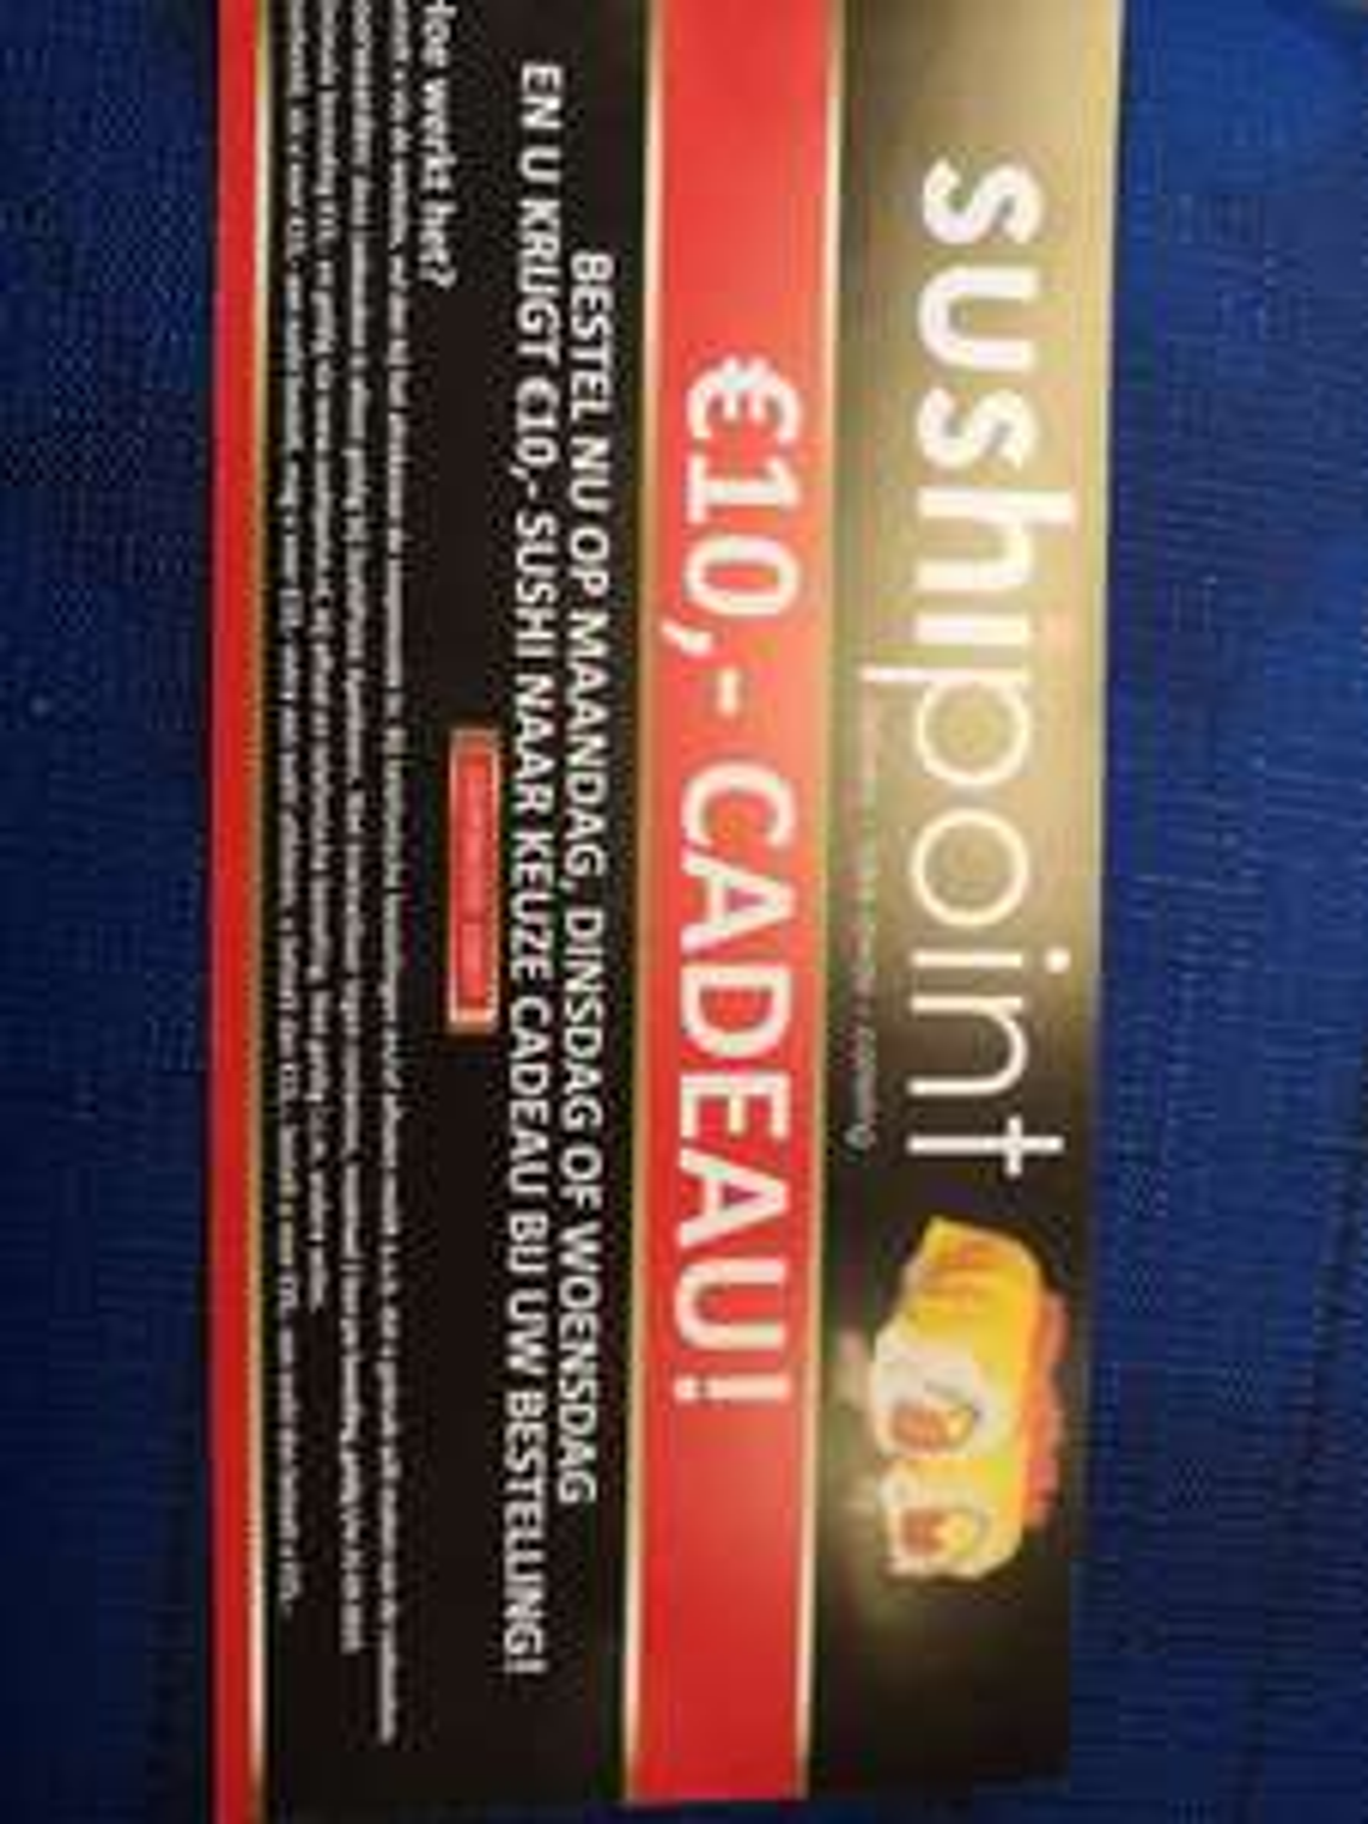 SushiPoint Apeldoorn, 10 euro korting